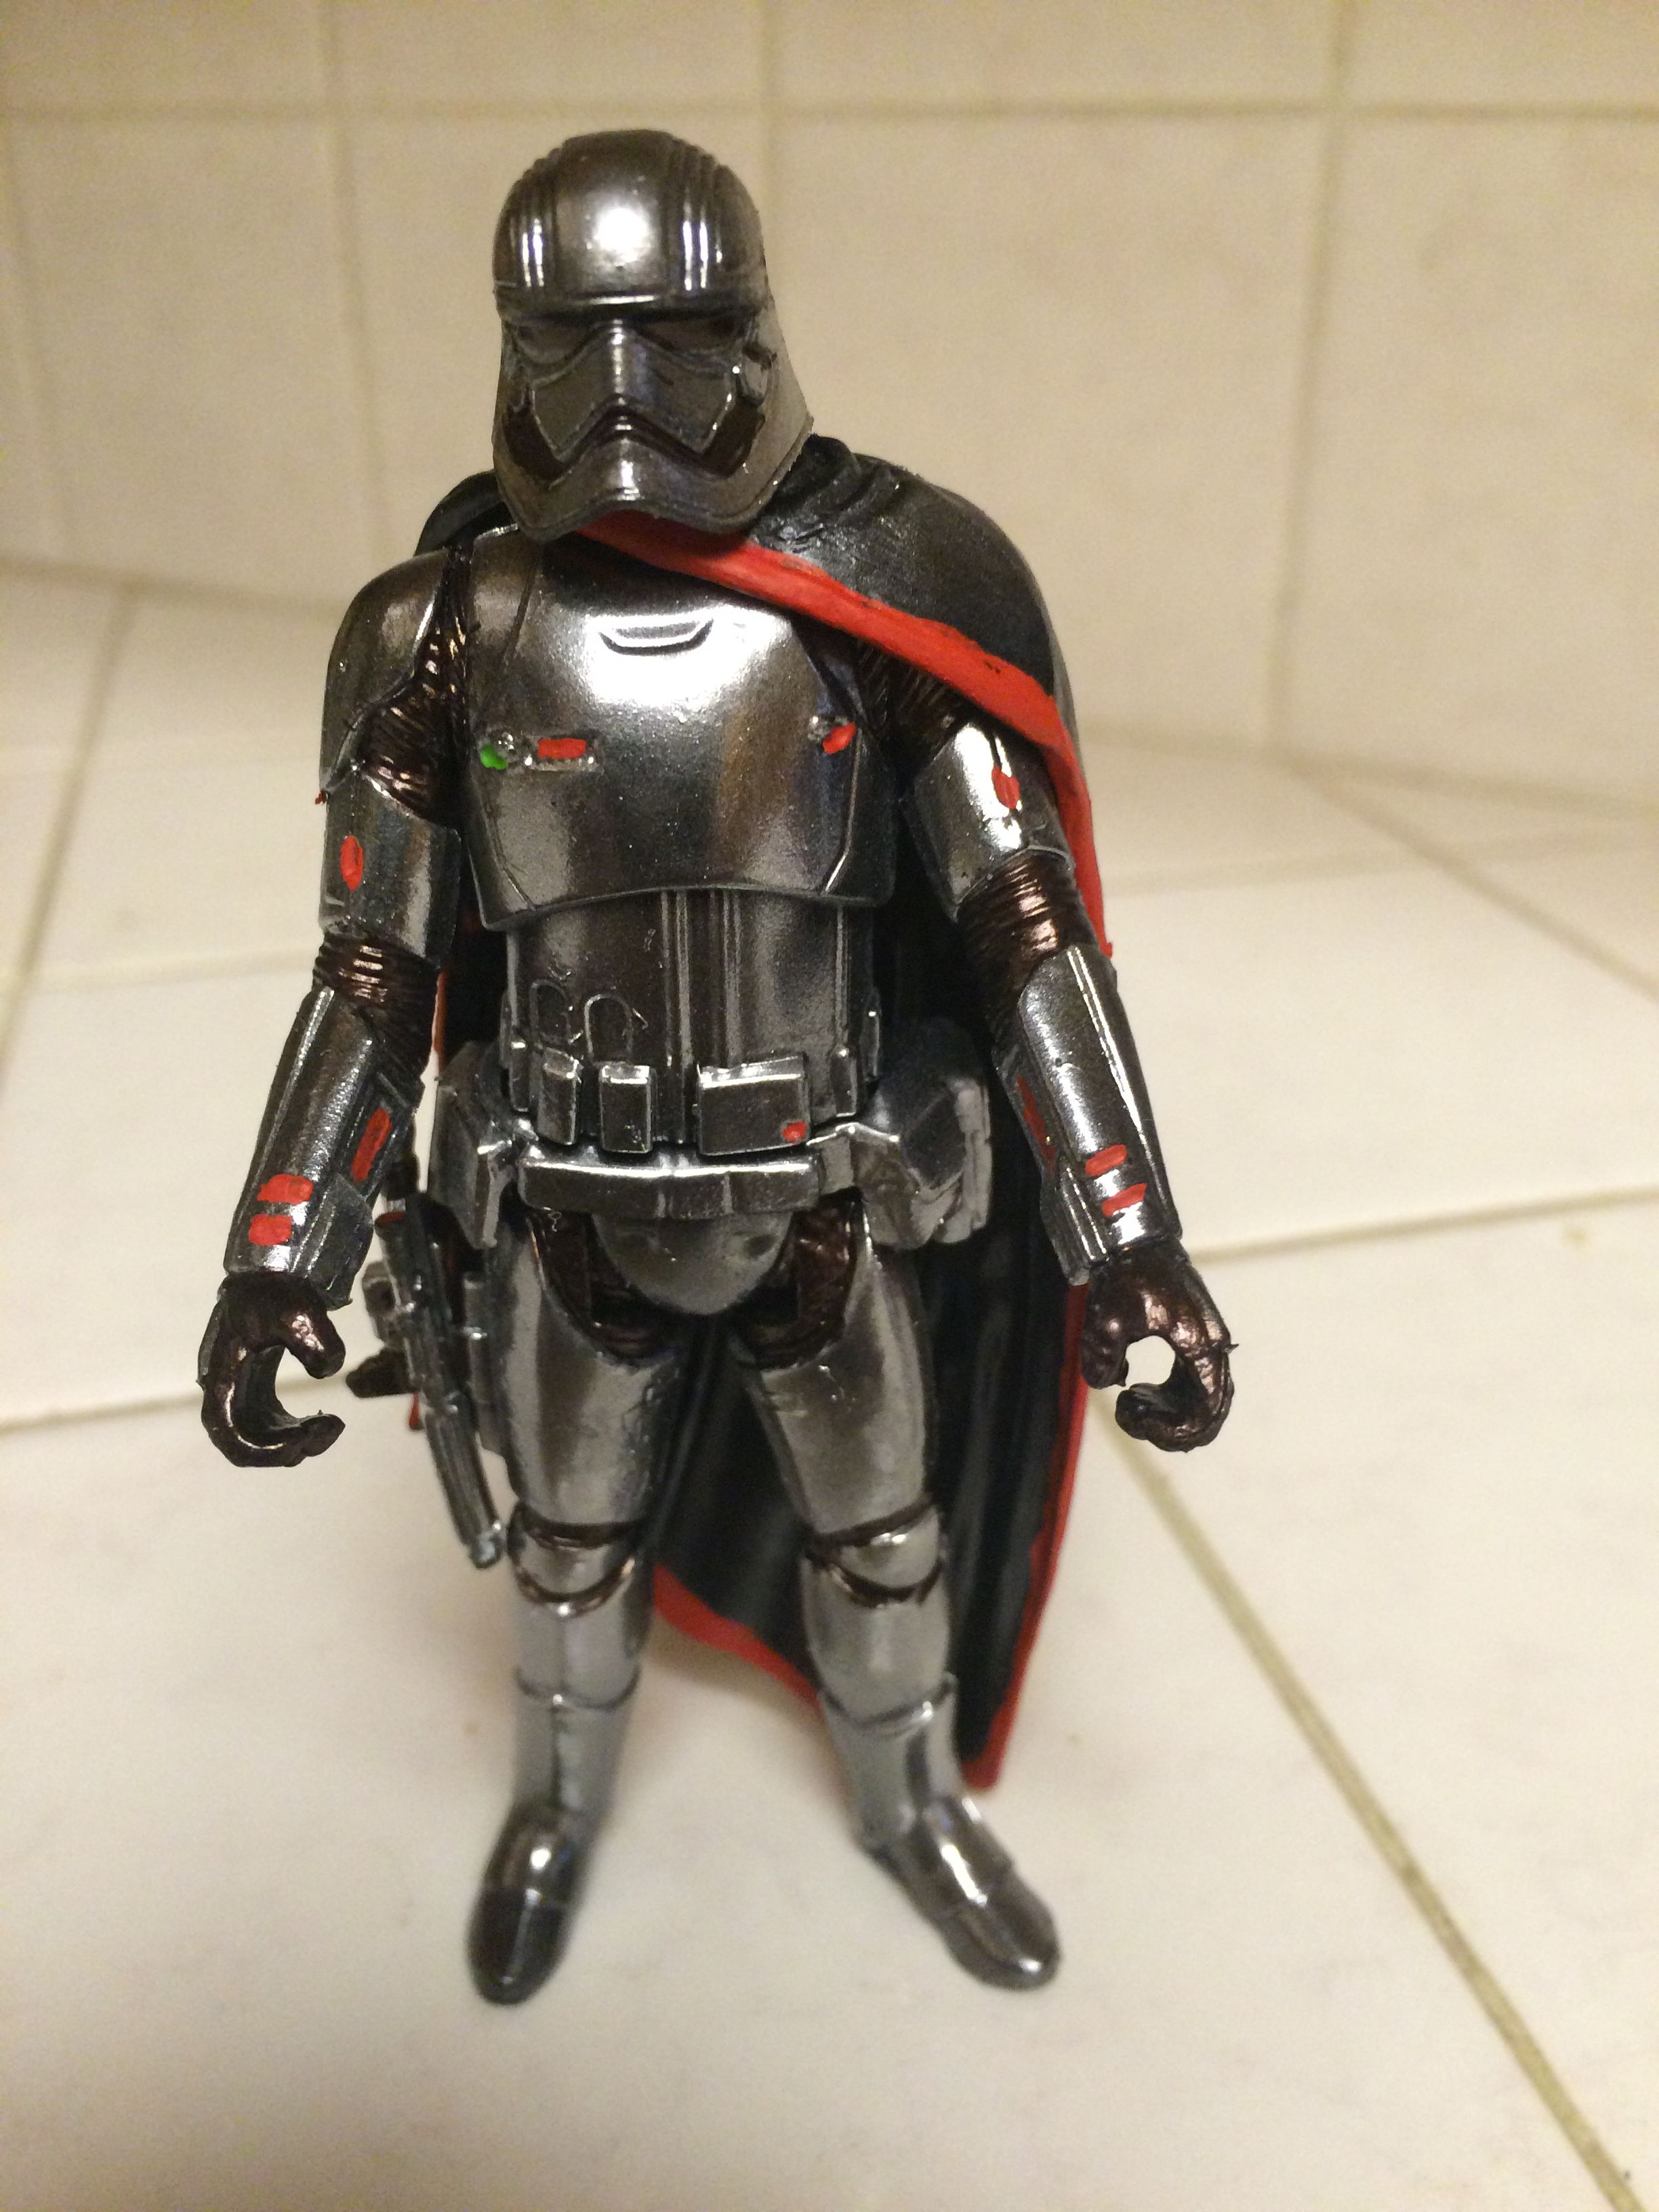 fec342d64824c9 My Latest Custom Captain Phasma from Star Wars the Force Awakens ...